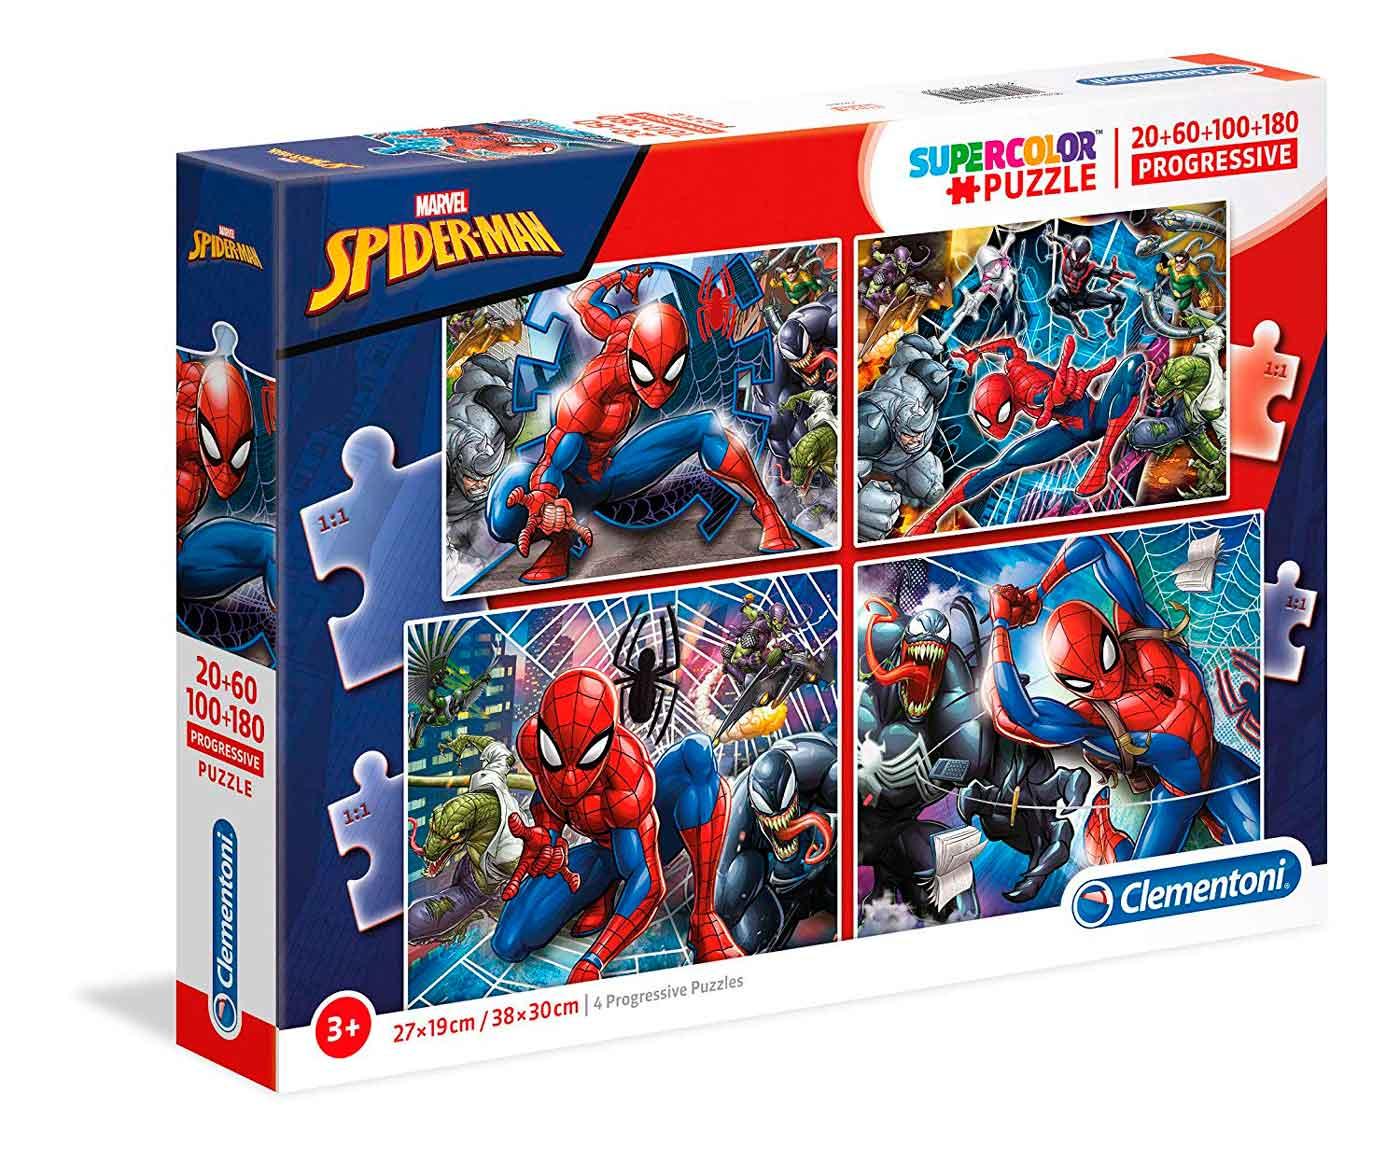 Puzzle Clementoni Progresivo Spiderman 20-60-100-180 Pzs.